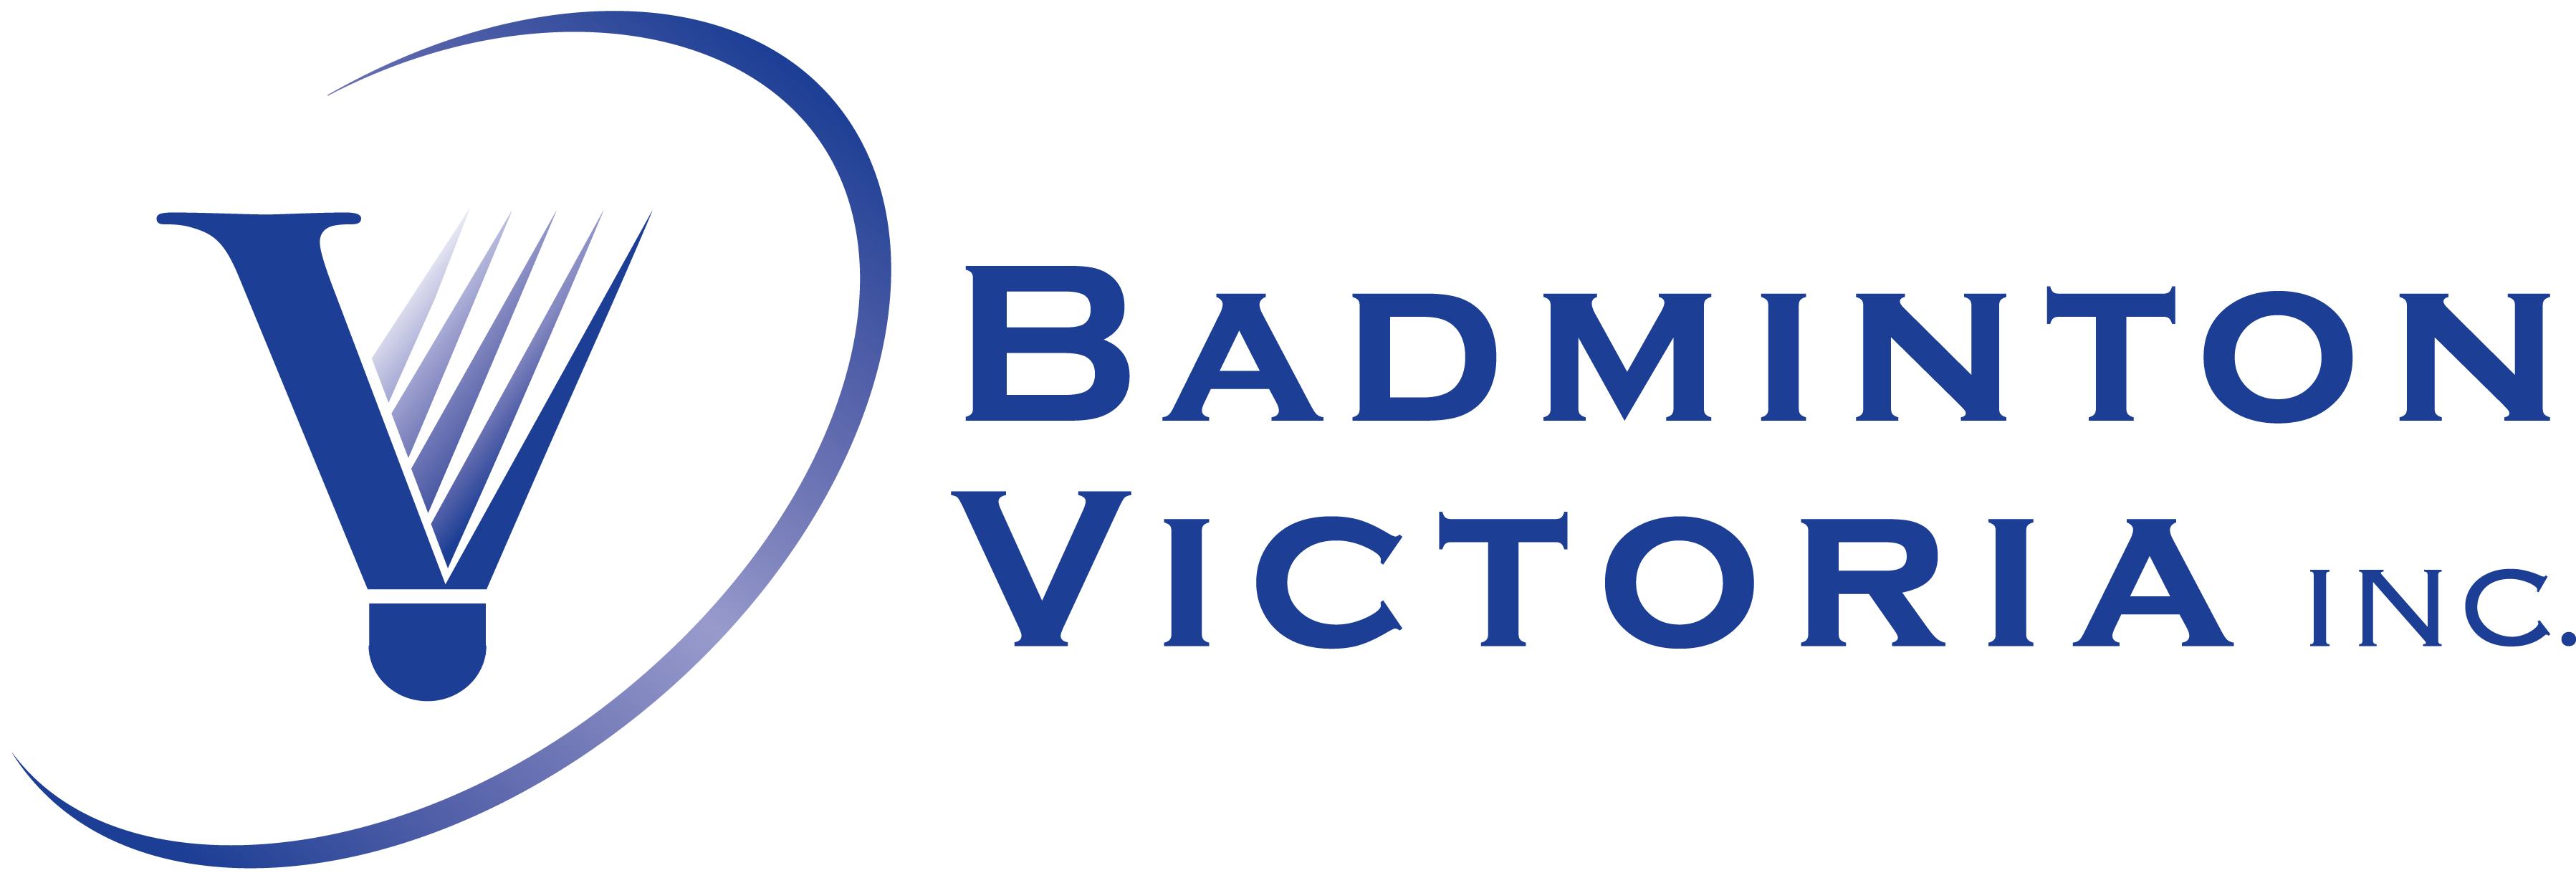 Badminton Victoria Logo - Horizontal - PNG Format